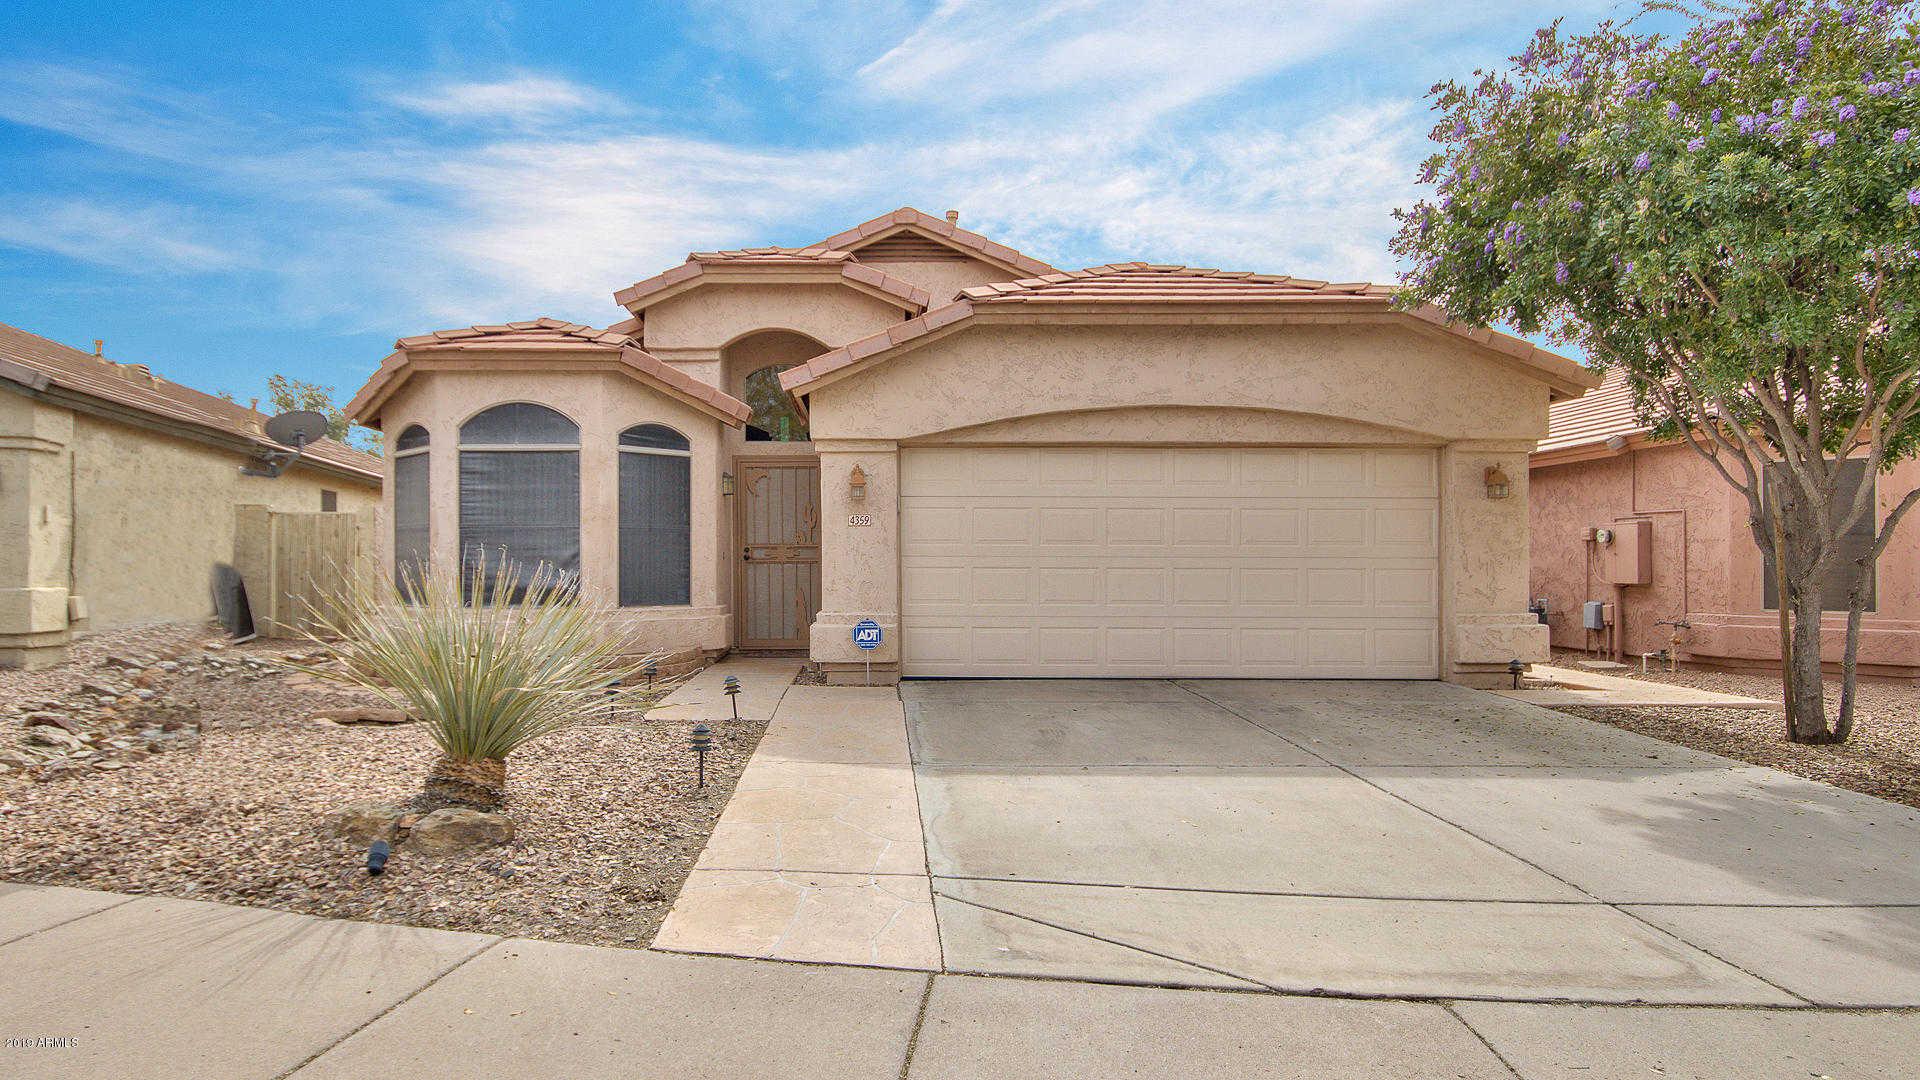 $355,000 - 3Br/2Ba - Home for Sale in Desert Ridge Parcel 7.9, Phoenix